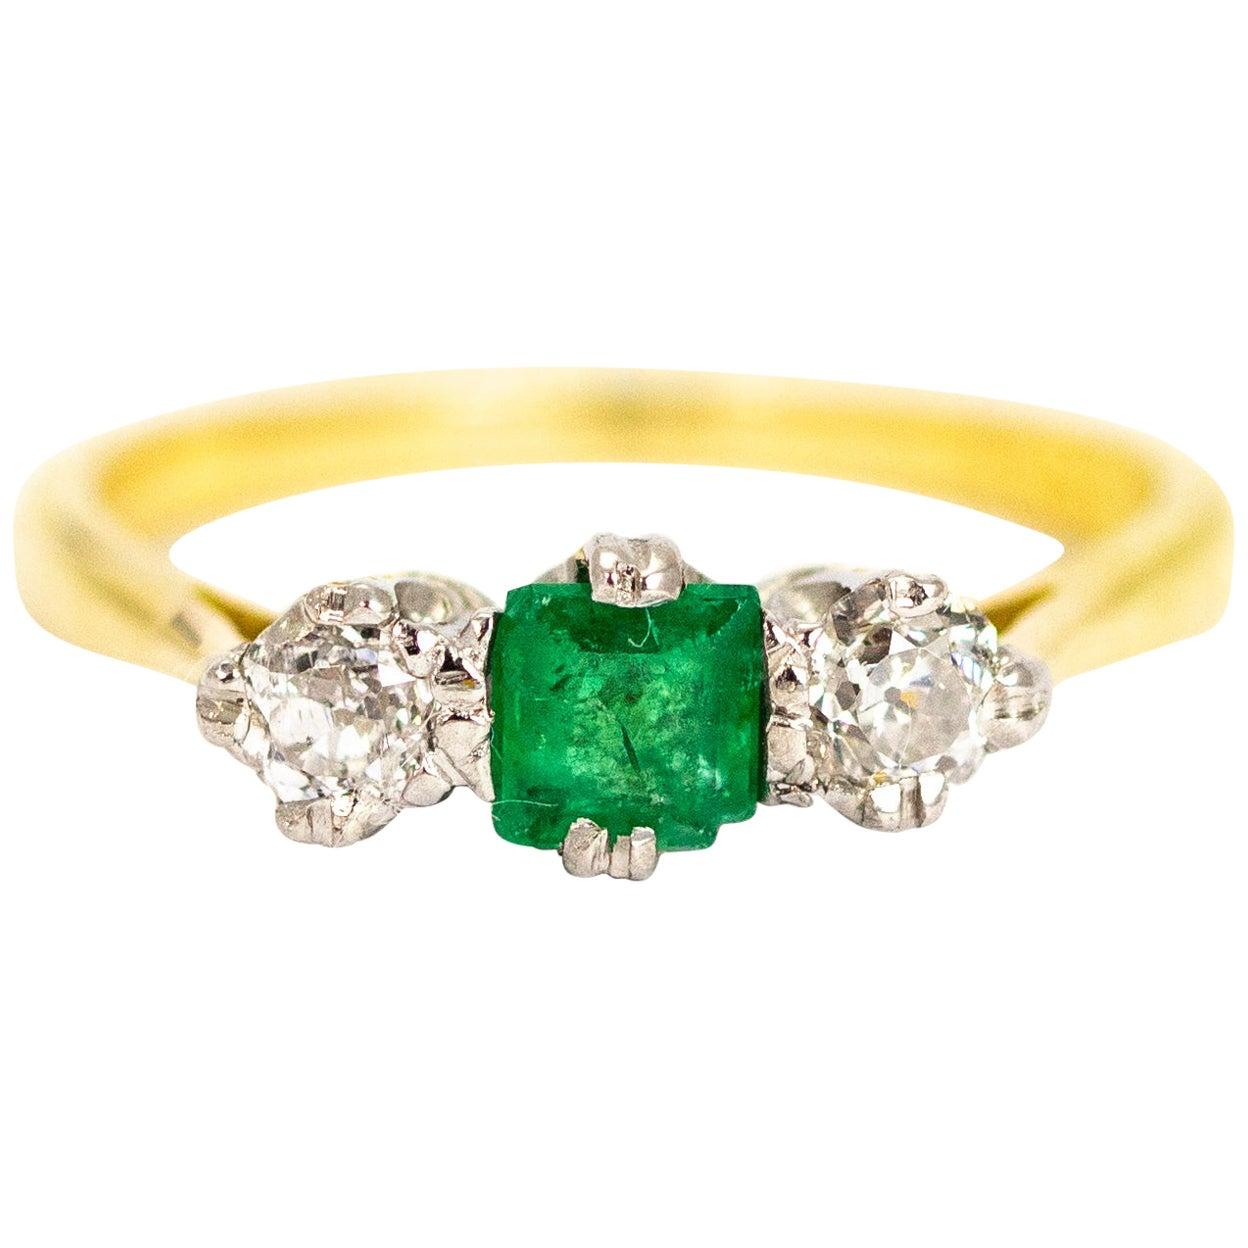 Vintage 18 Carat Gold Emerald and Diamond Three-Stone Ring